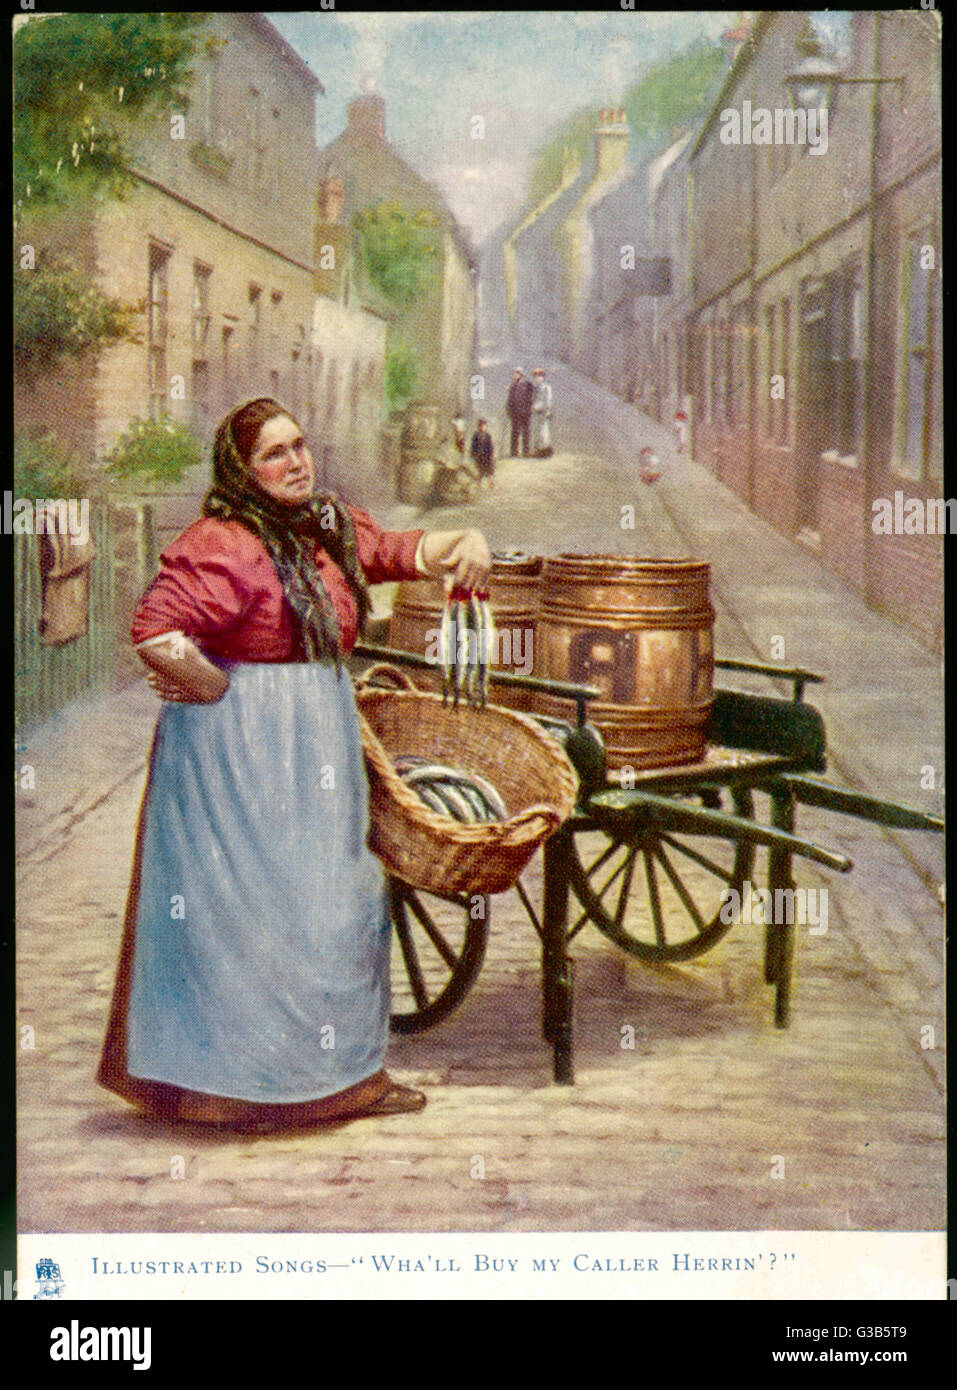 """Wha'll buy my caller herrin'"" cries the fish seller        Date: 1904 - Stock Image"